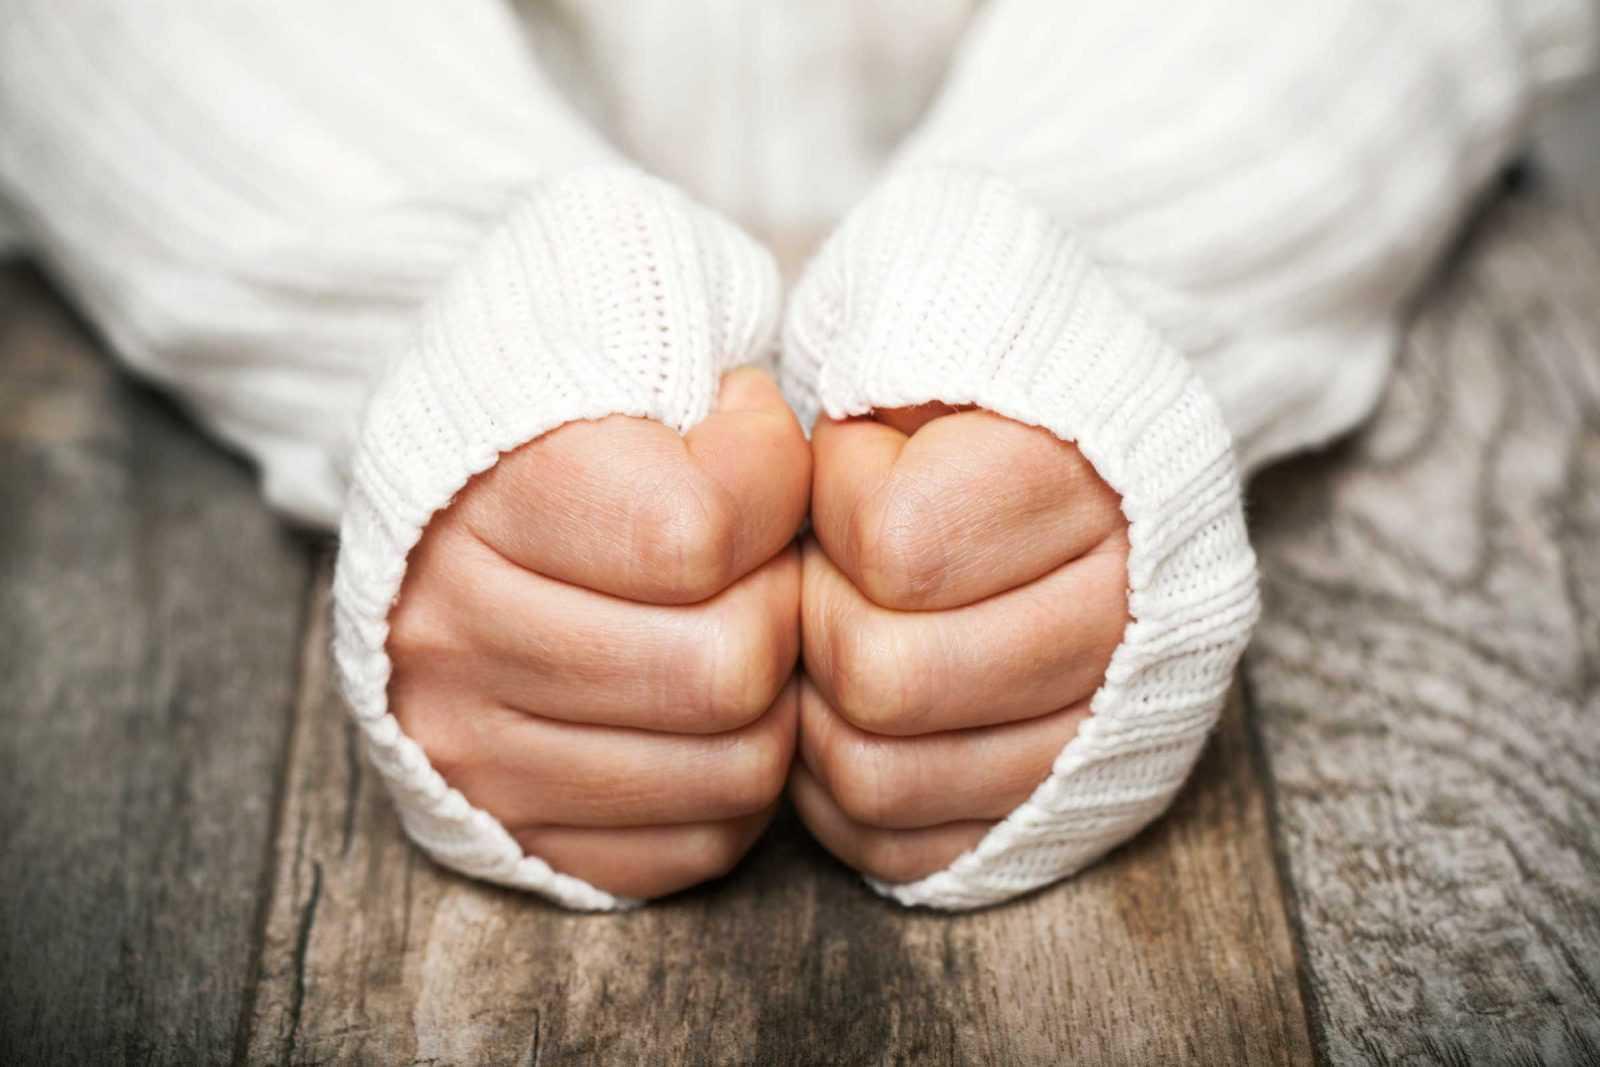 سردی دست و پا